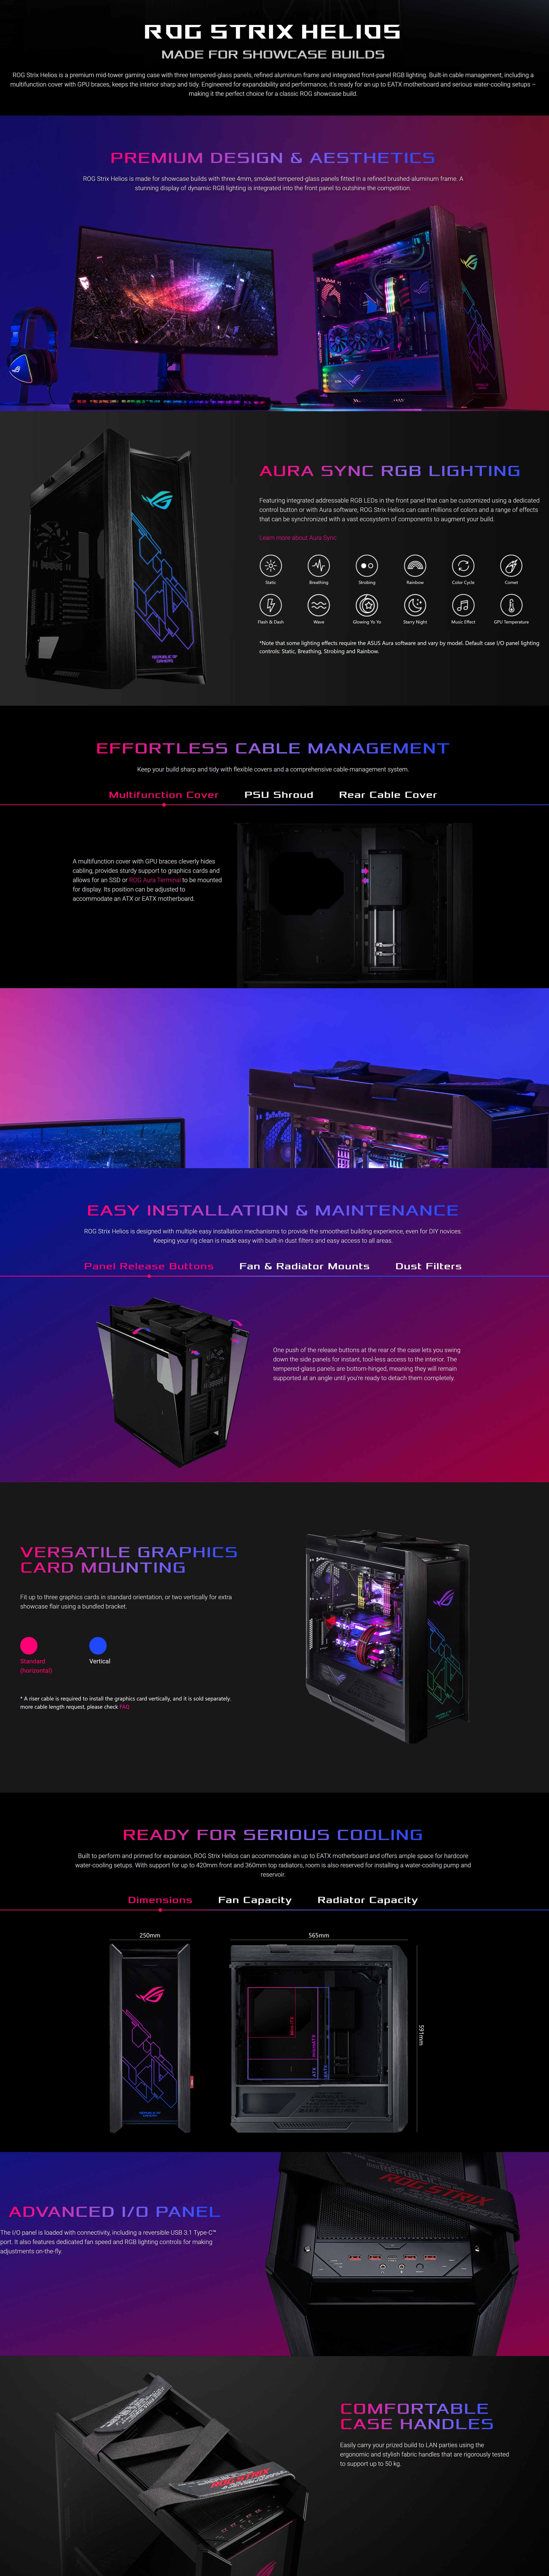 screencapture-asus-au-Gaming-Case-ROG-Strix-Helios-overview-2020-01-07-10_48_36.jpg